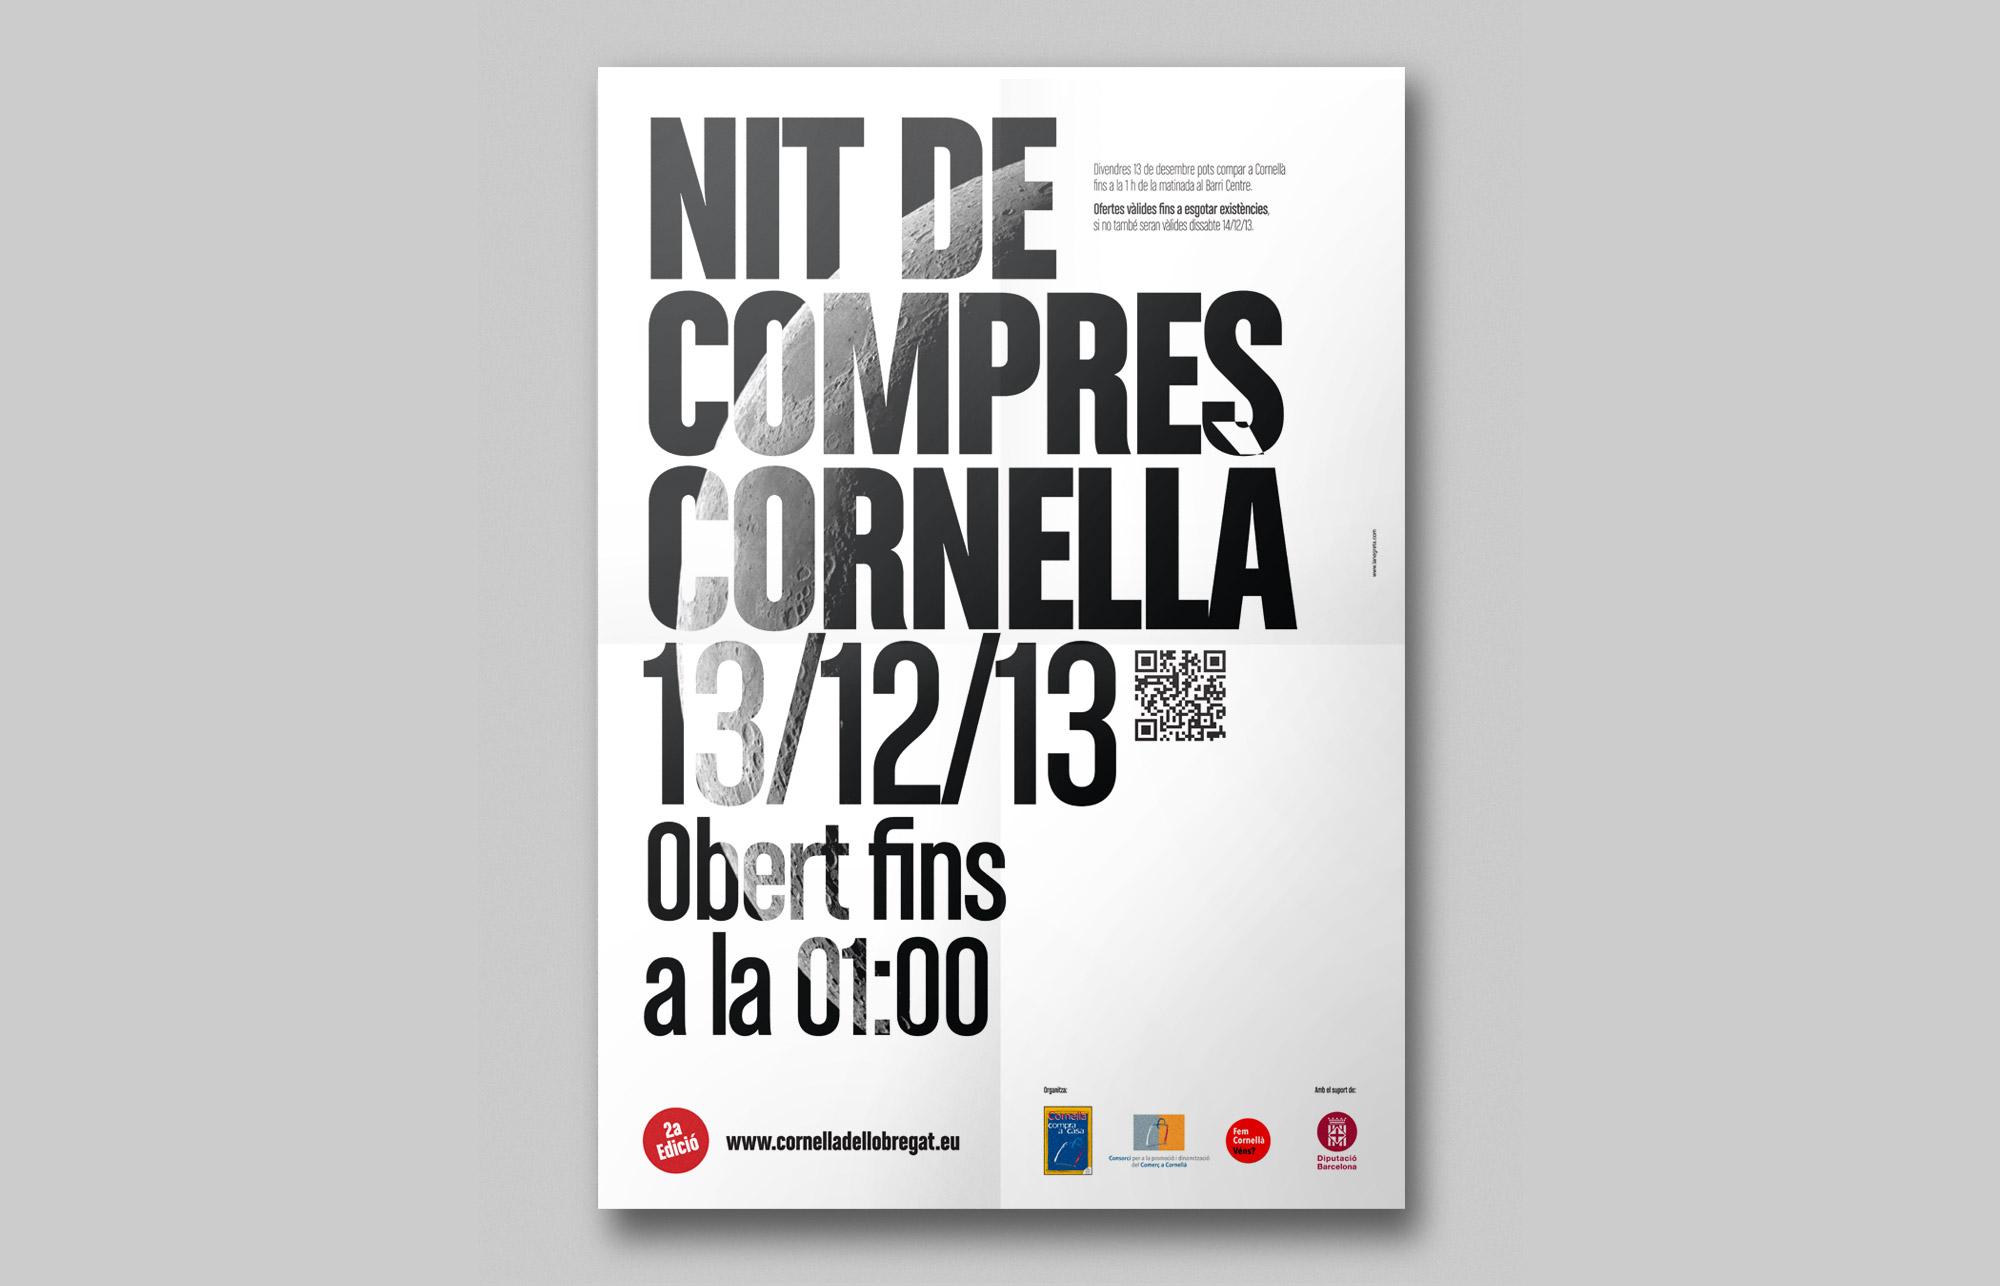 CPDCC-NITDECOMPRES-1.jpg